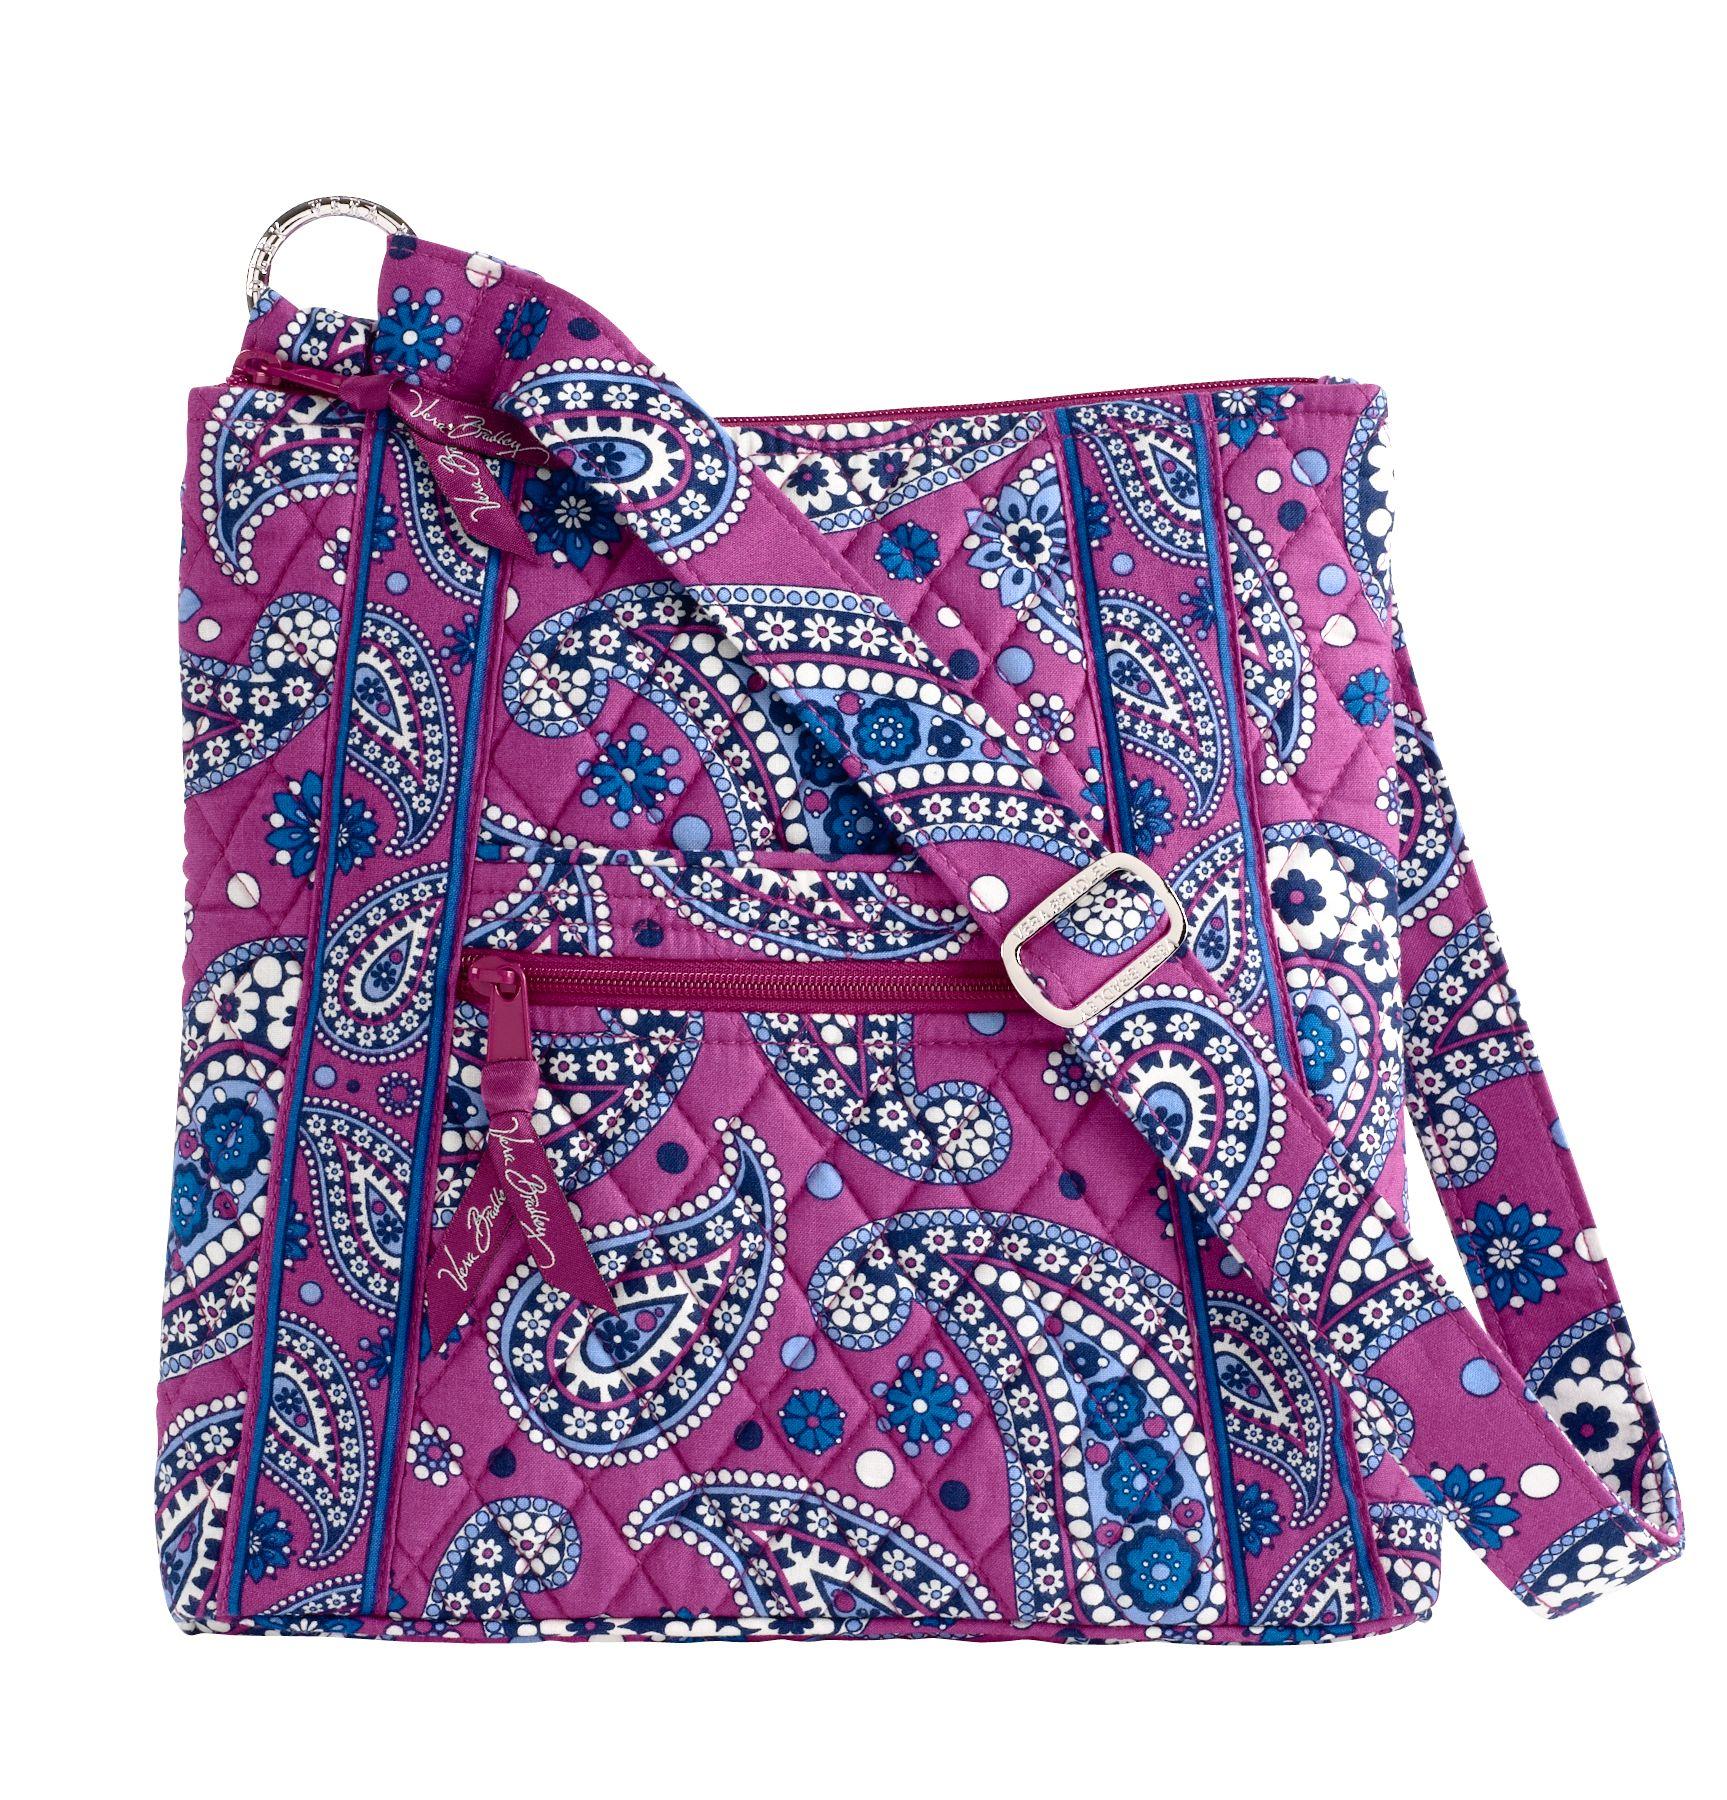 vera bradley purple purse | eBay